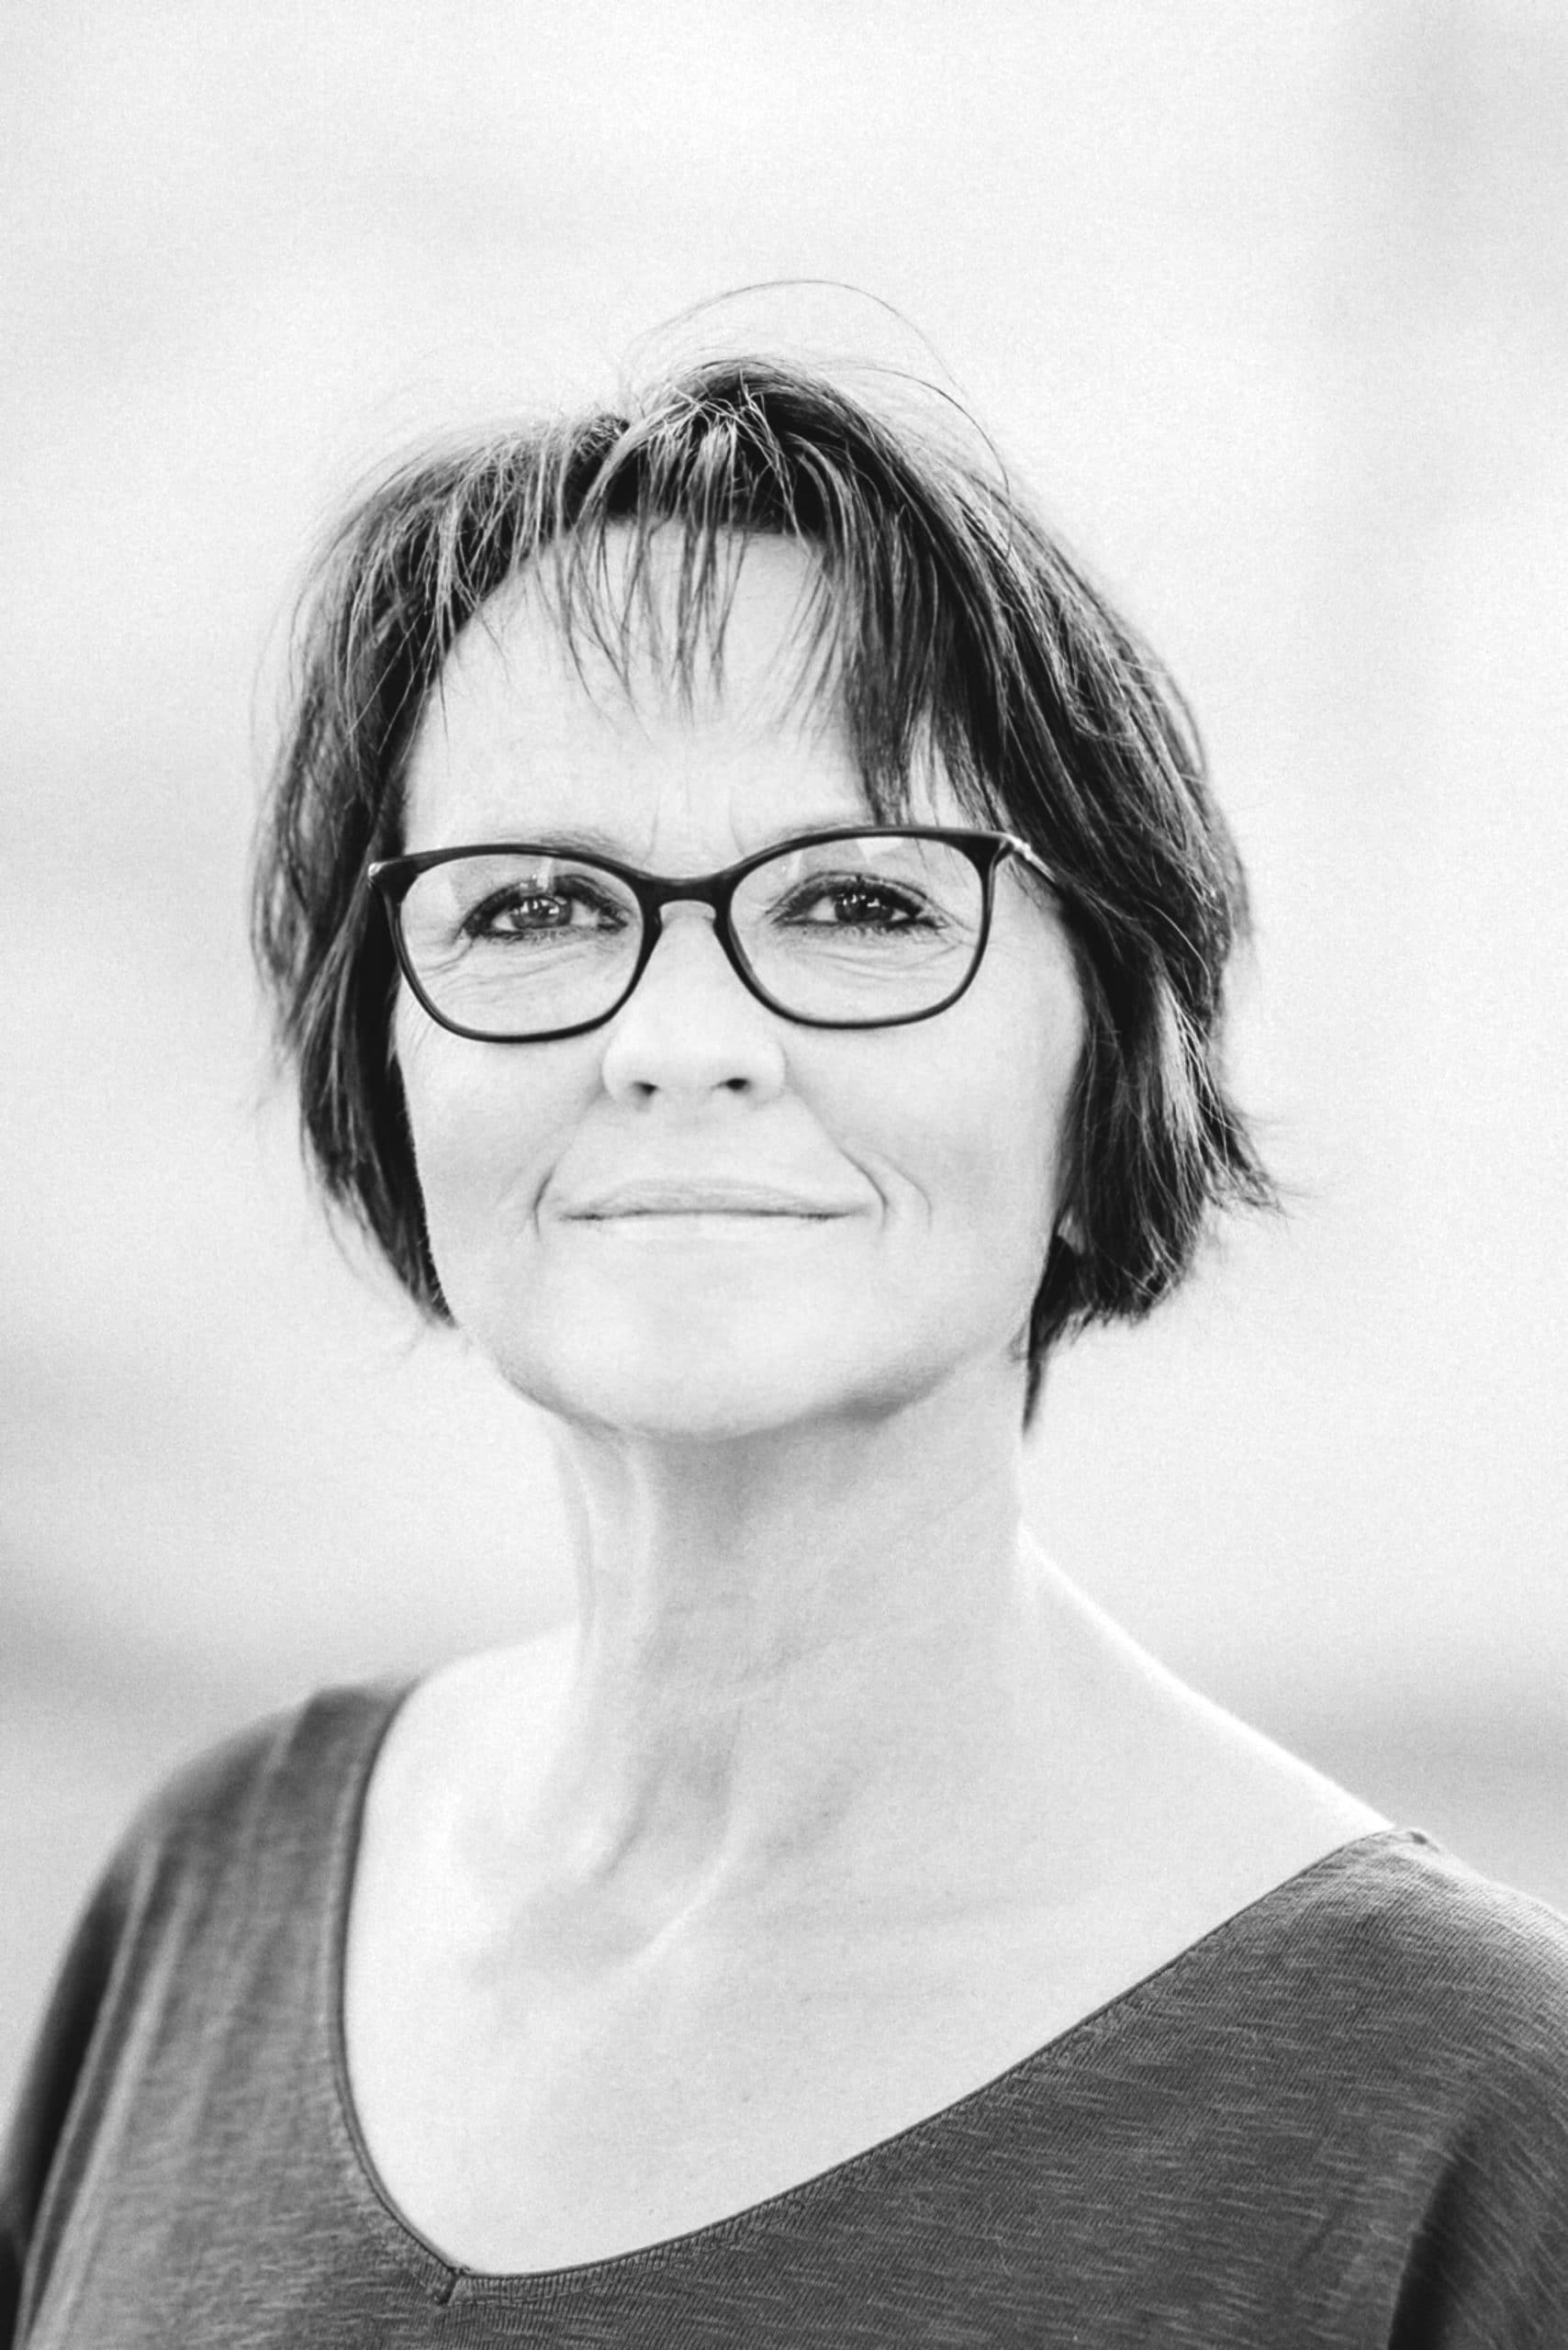 Conseillère en formation - Nathalie Taffu